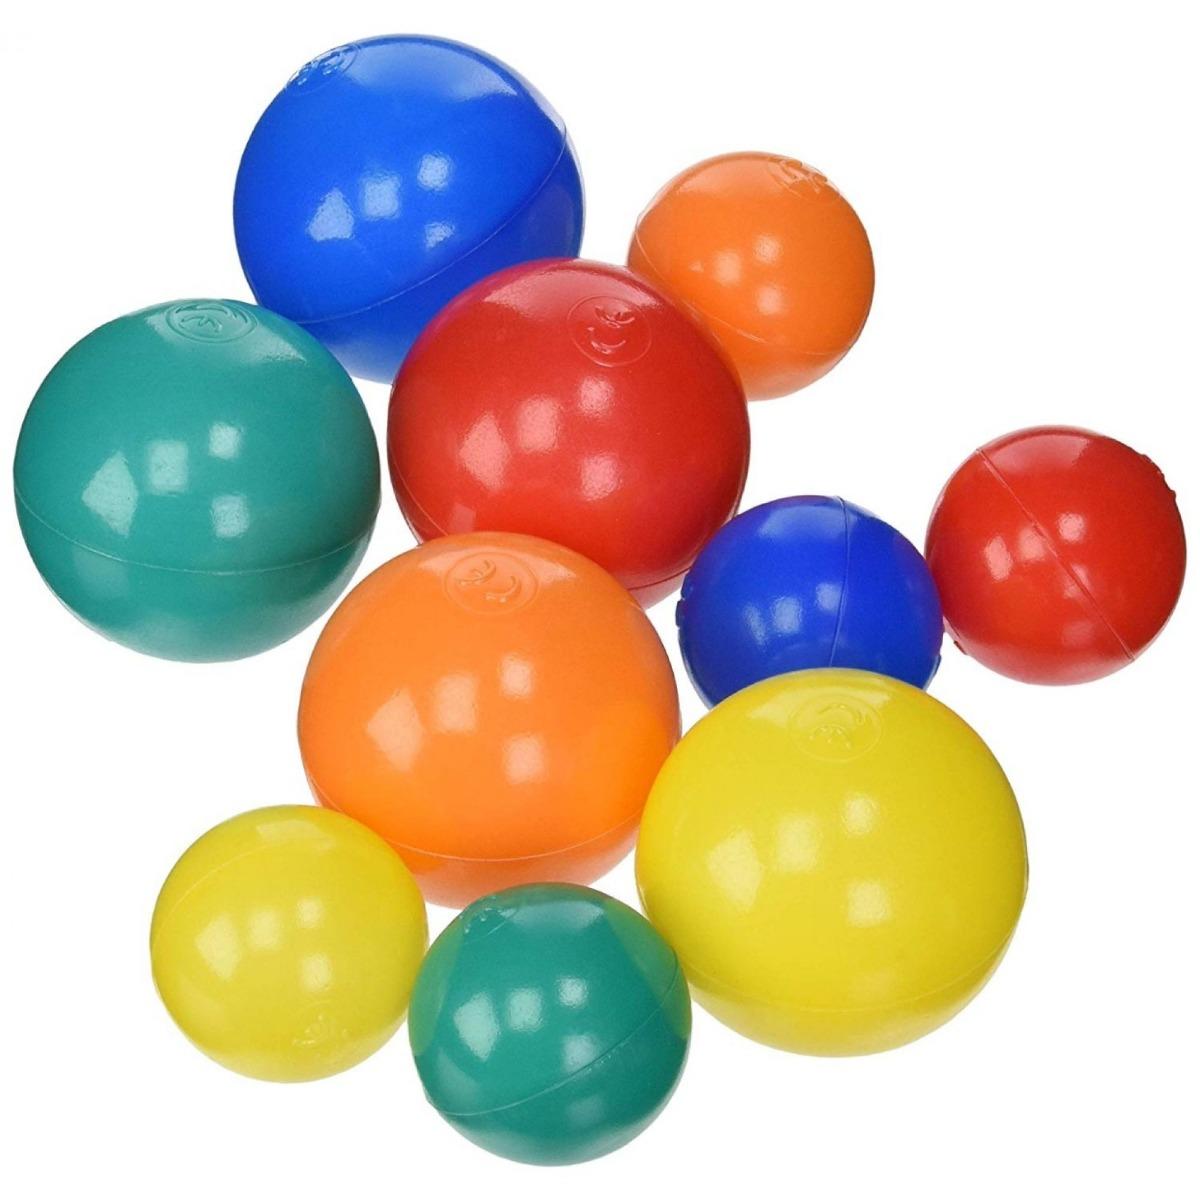 Assorted Pool Balls